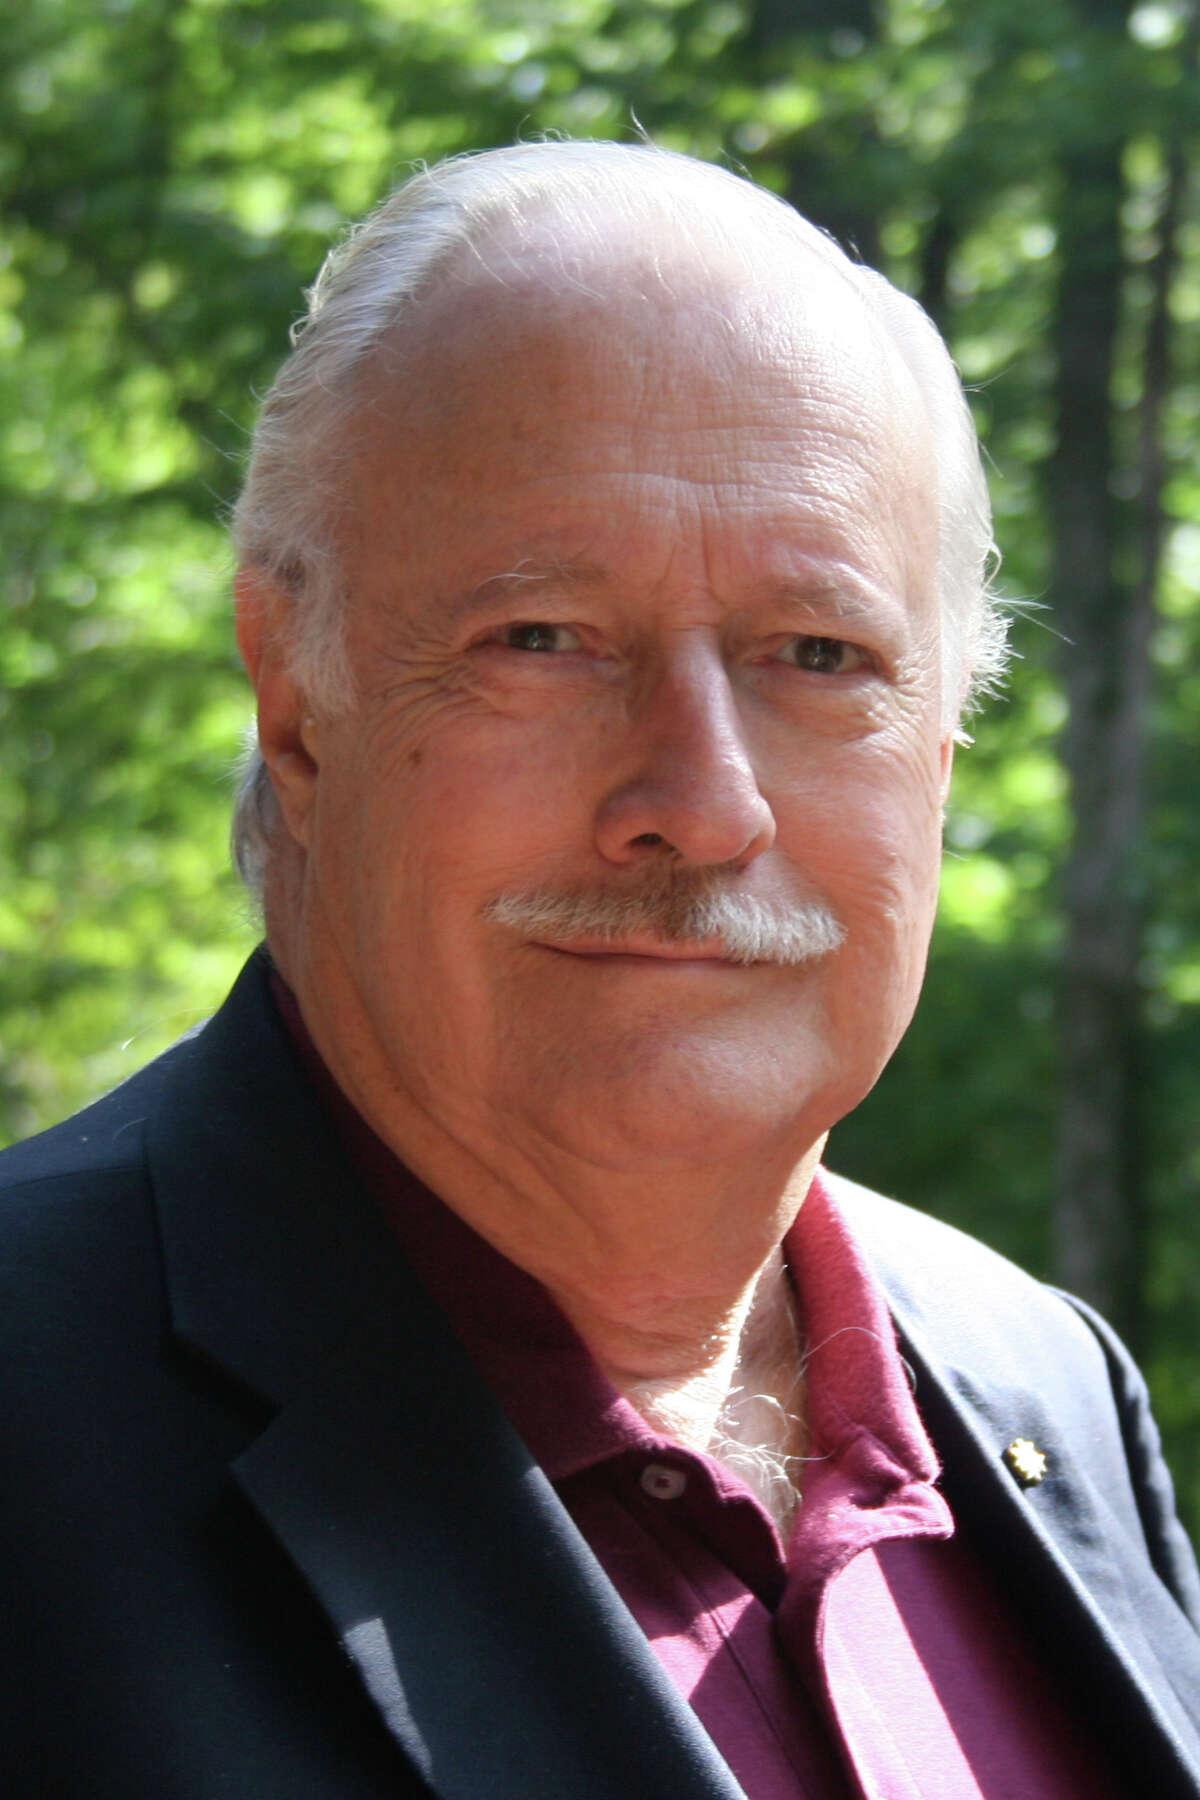 Board of Education member Peter von Braun